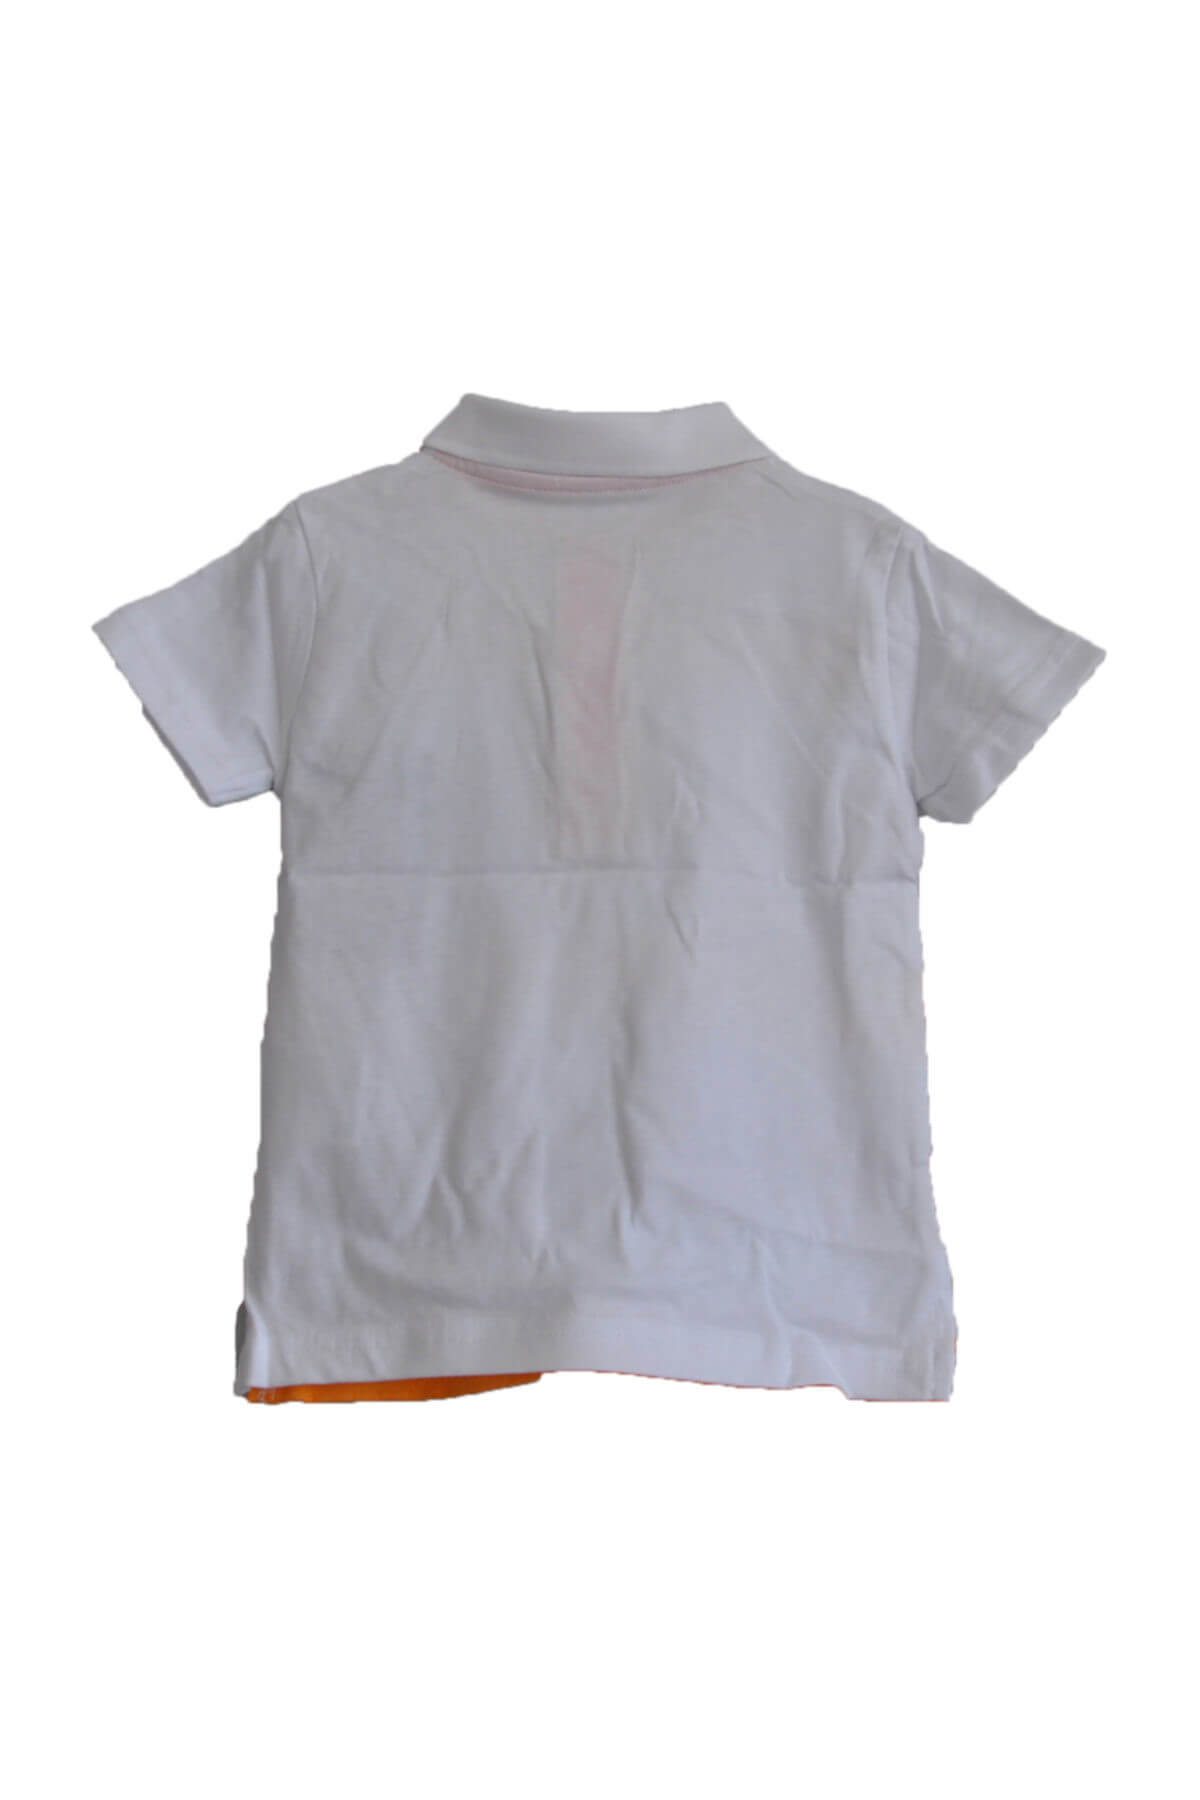 Zeyland Cızgılı Galatasaray Bebek T-Shirt ZB850 2